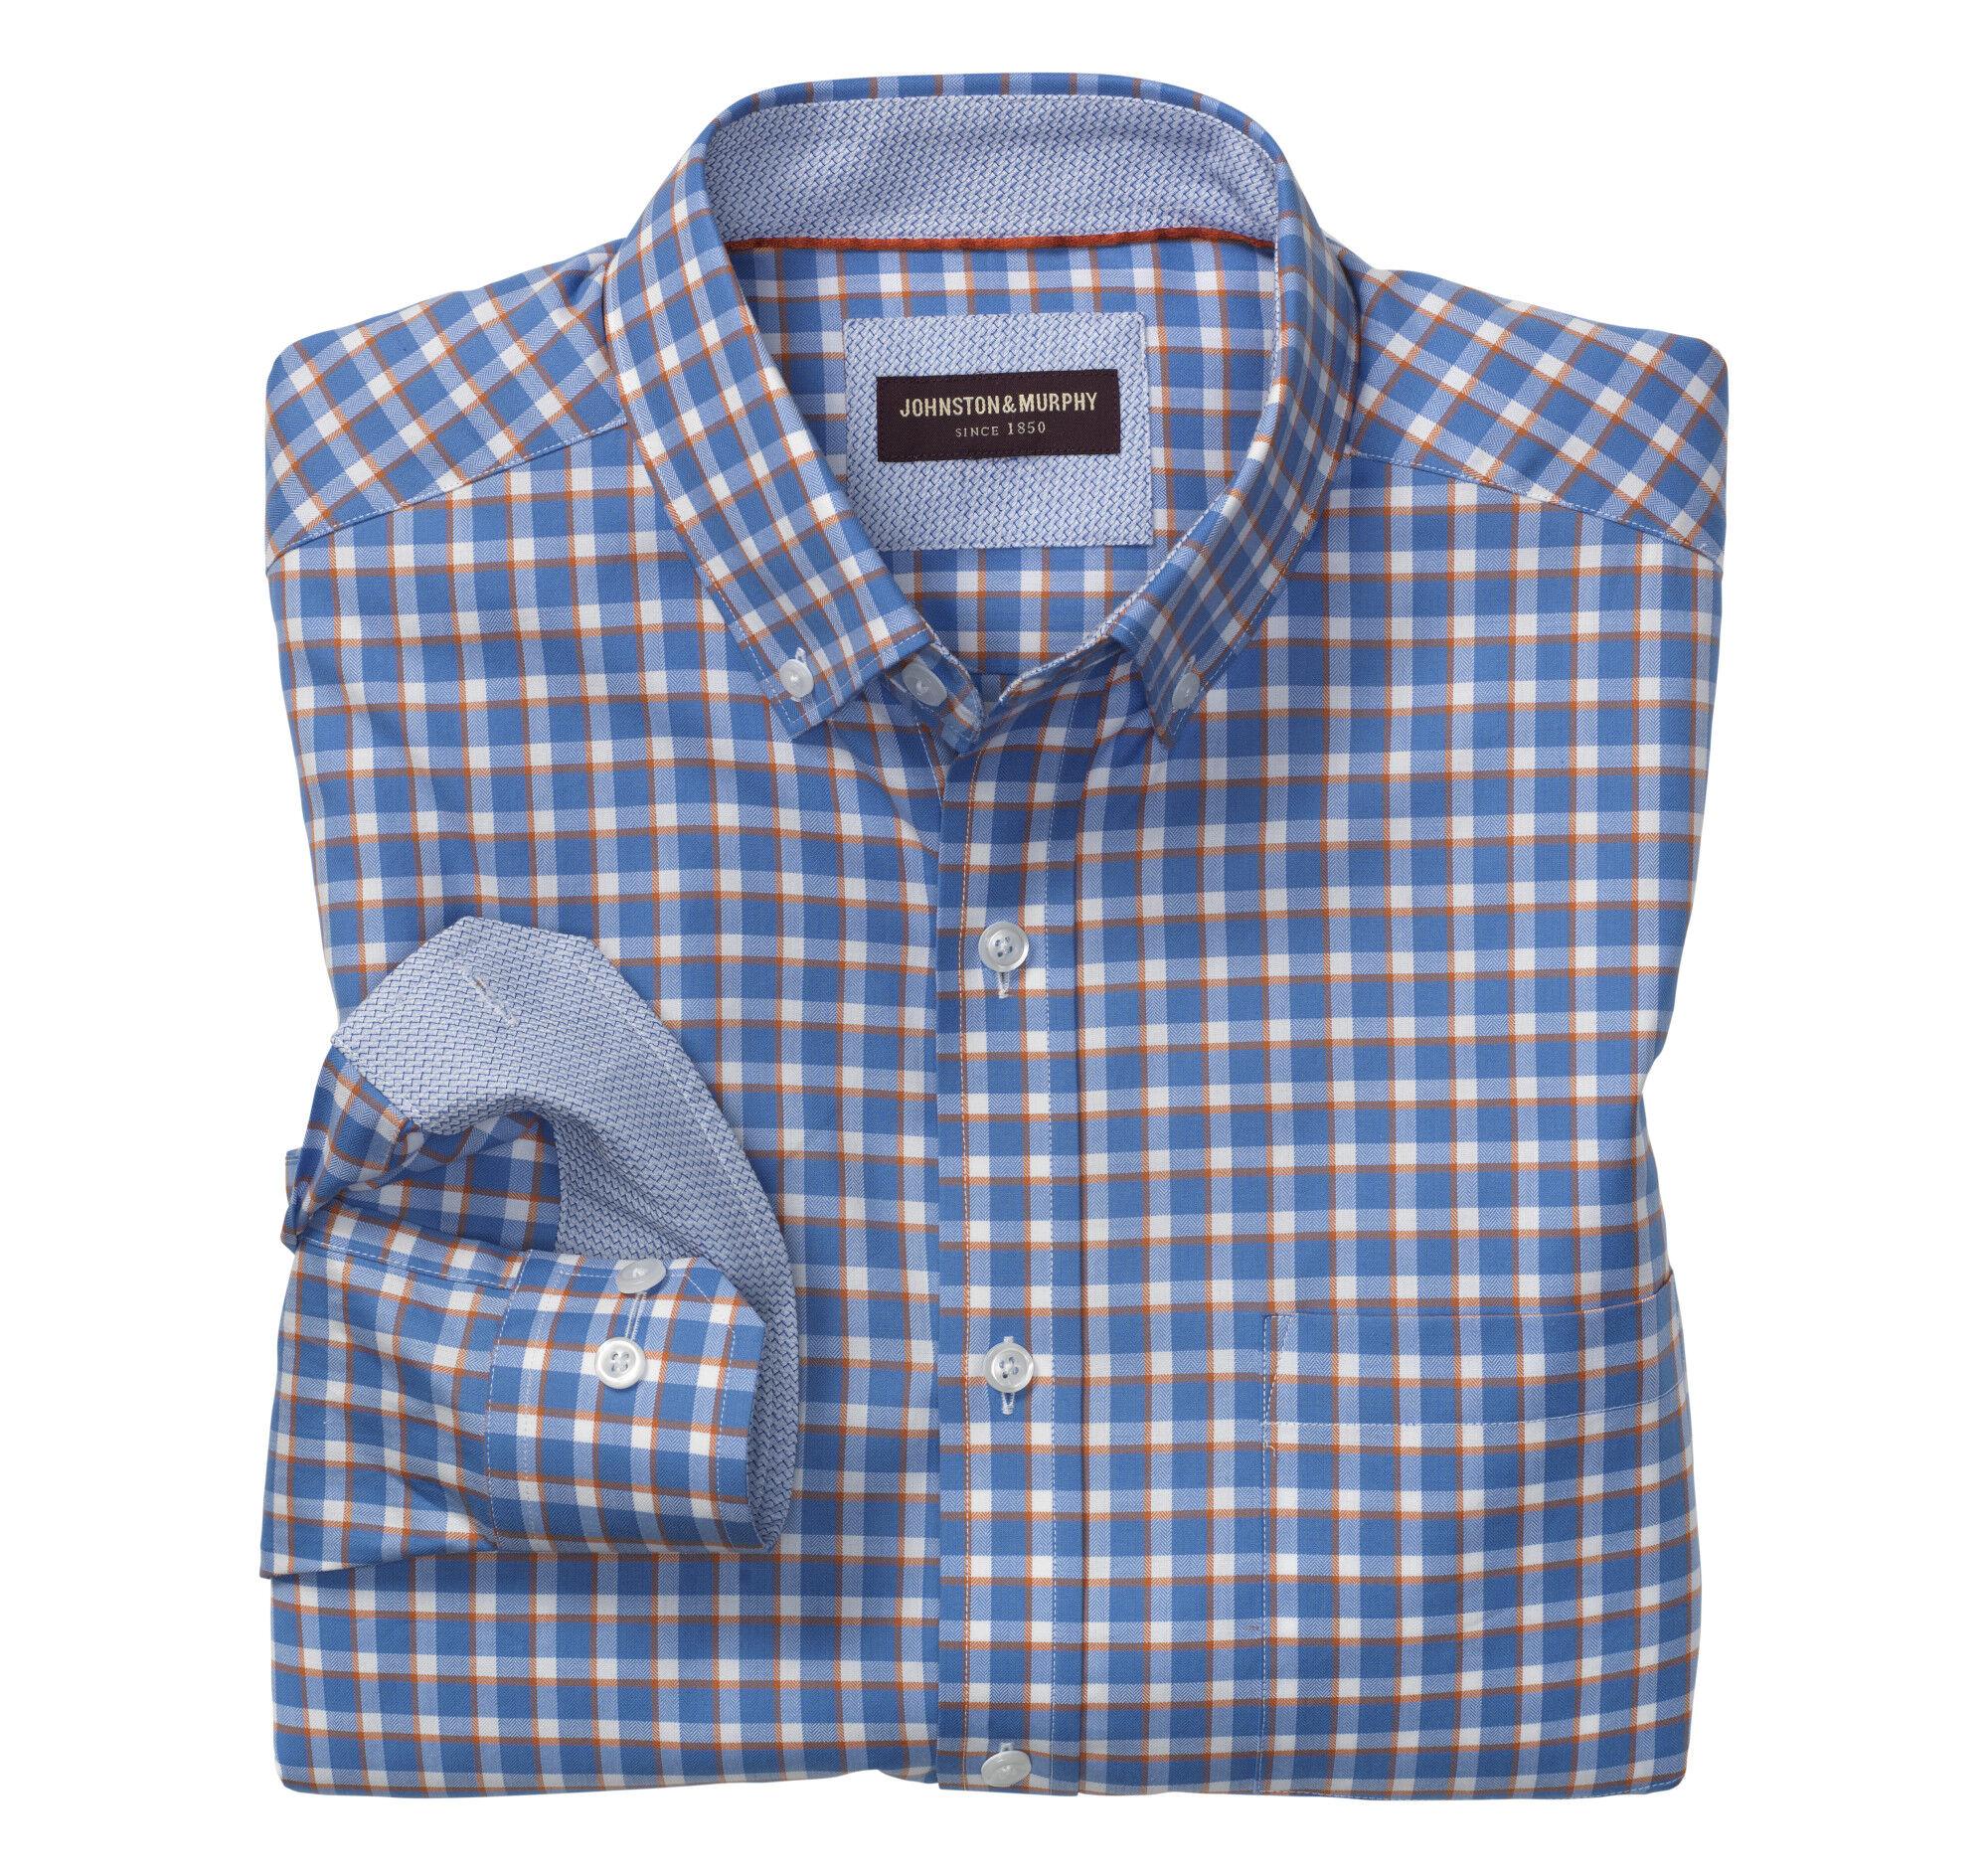 14604b3916 Blue Button Down Shirt With White Collar